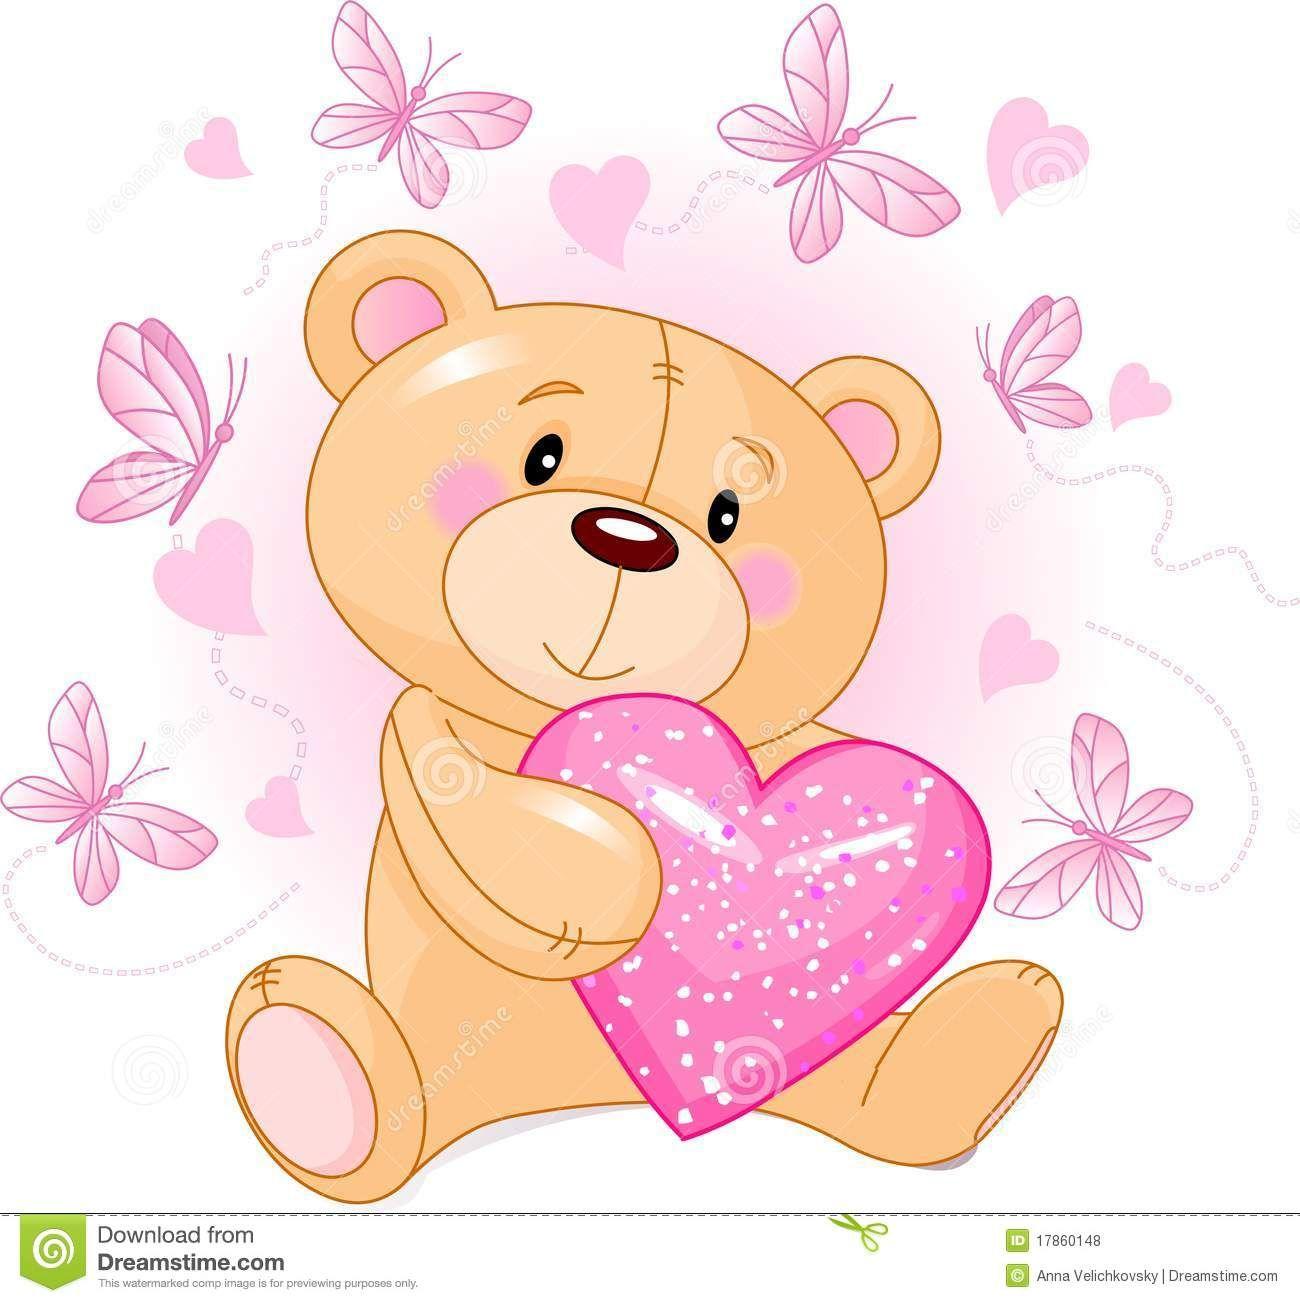 Pin By Pigmento On Child Kids Teddy Bear Sketch Bear Sketch Cute Teddy Bears